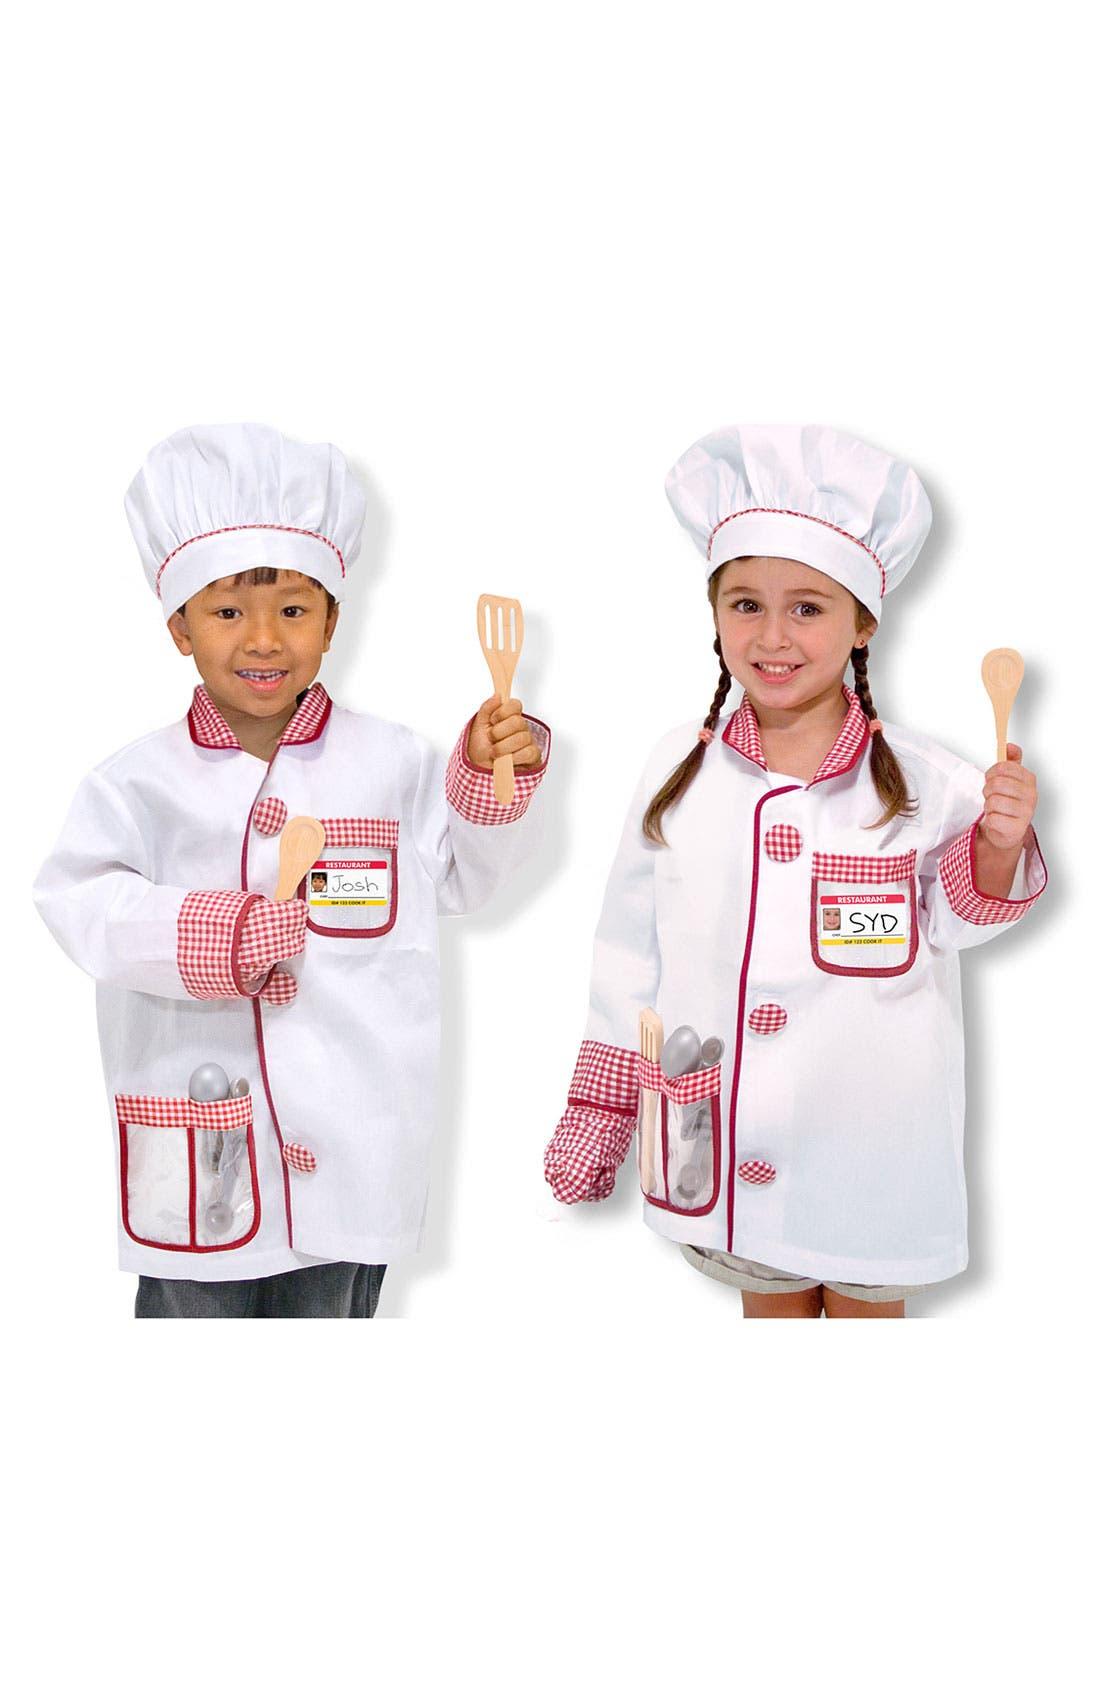 Alternate Image 1 Selected - Melissa & Doug Chef Costume (Toddler)